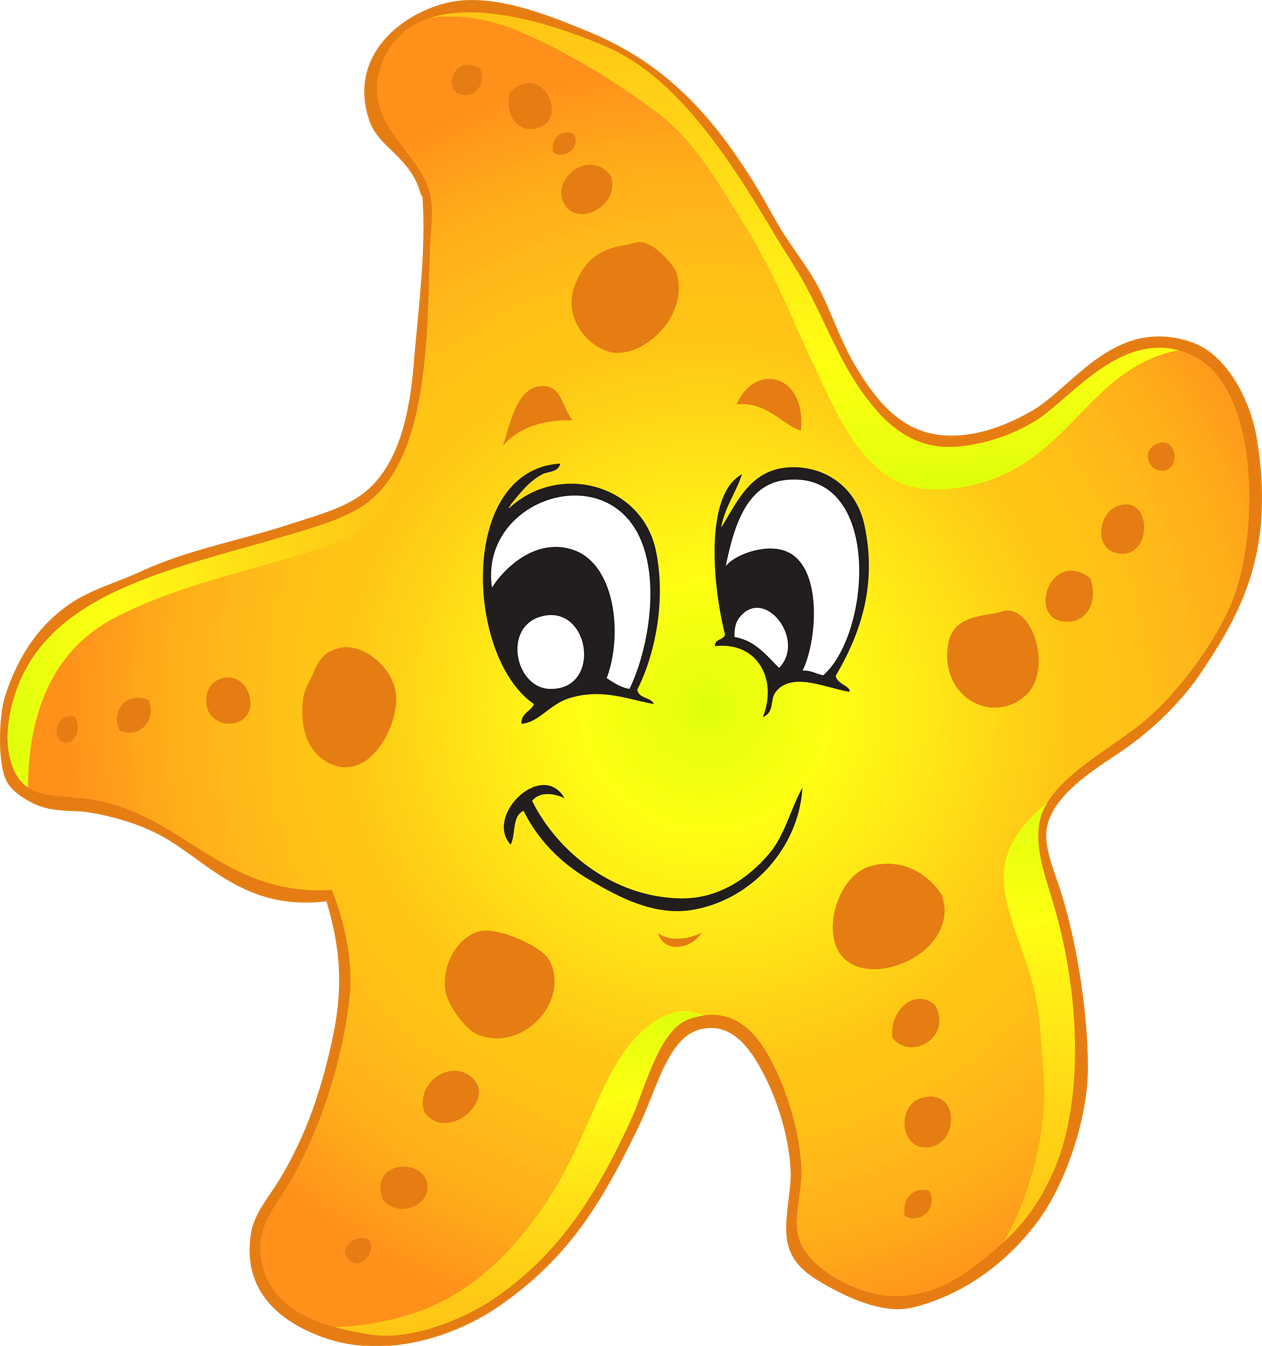 Starfish Cute Of A Sea Star Clipart-Starfish cute of a sea star clipart-17